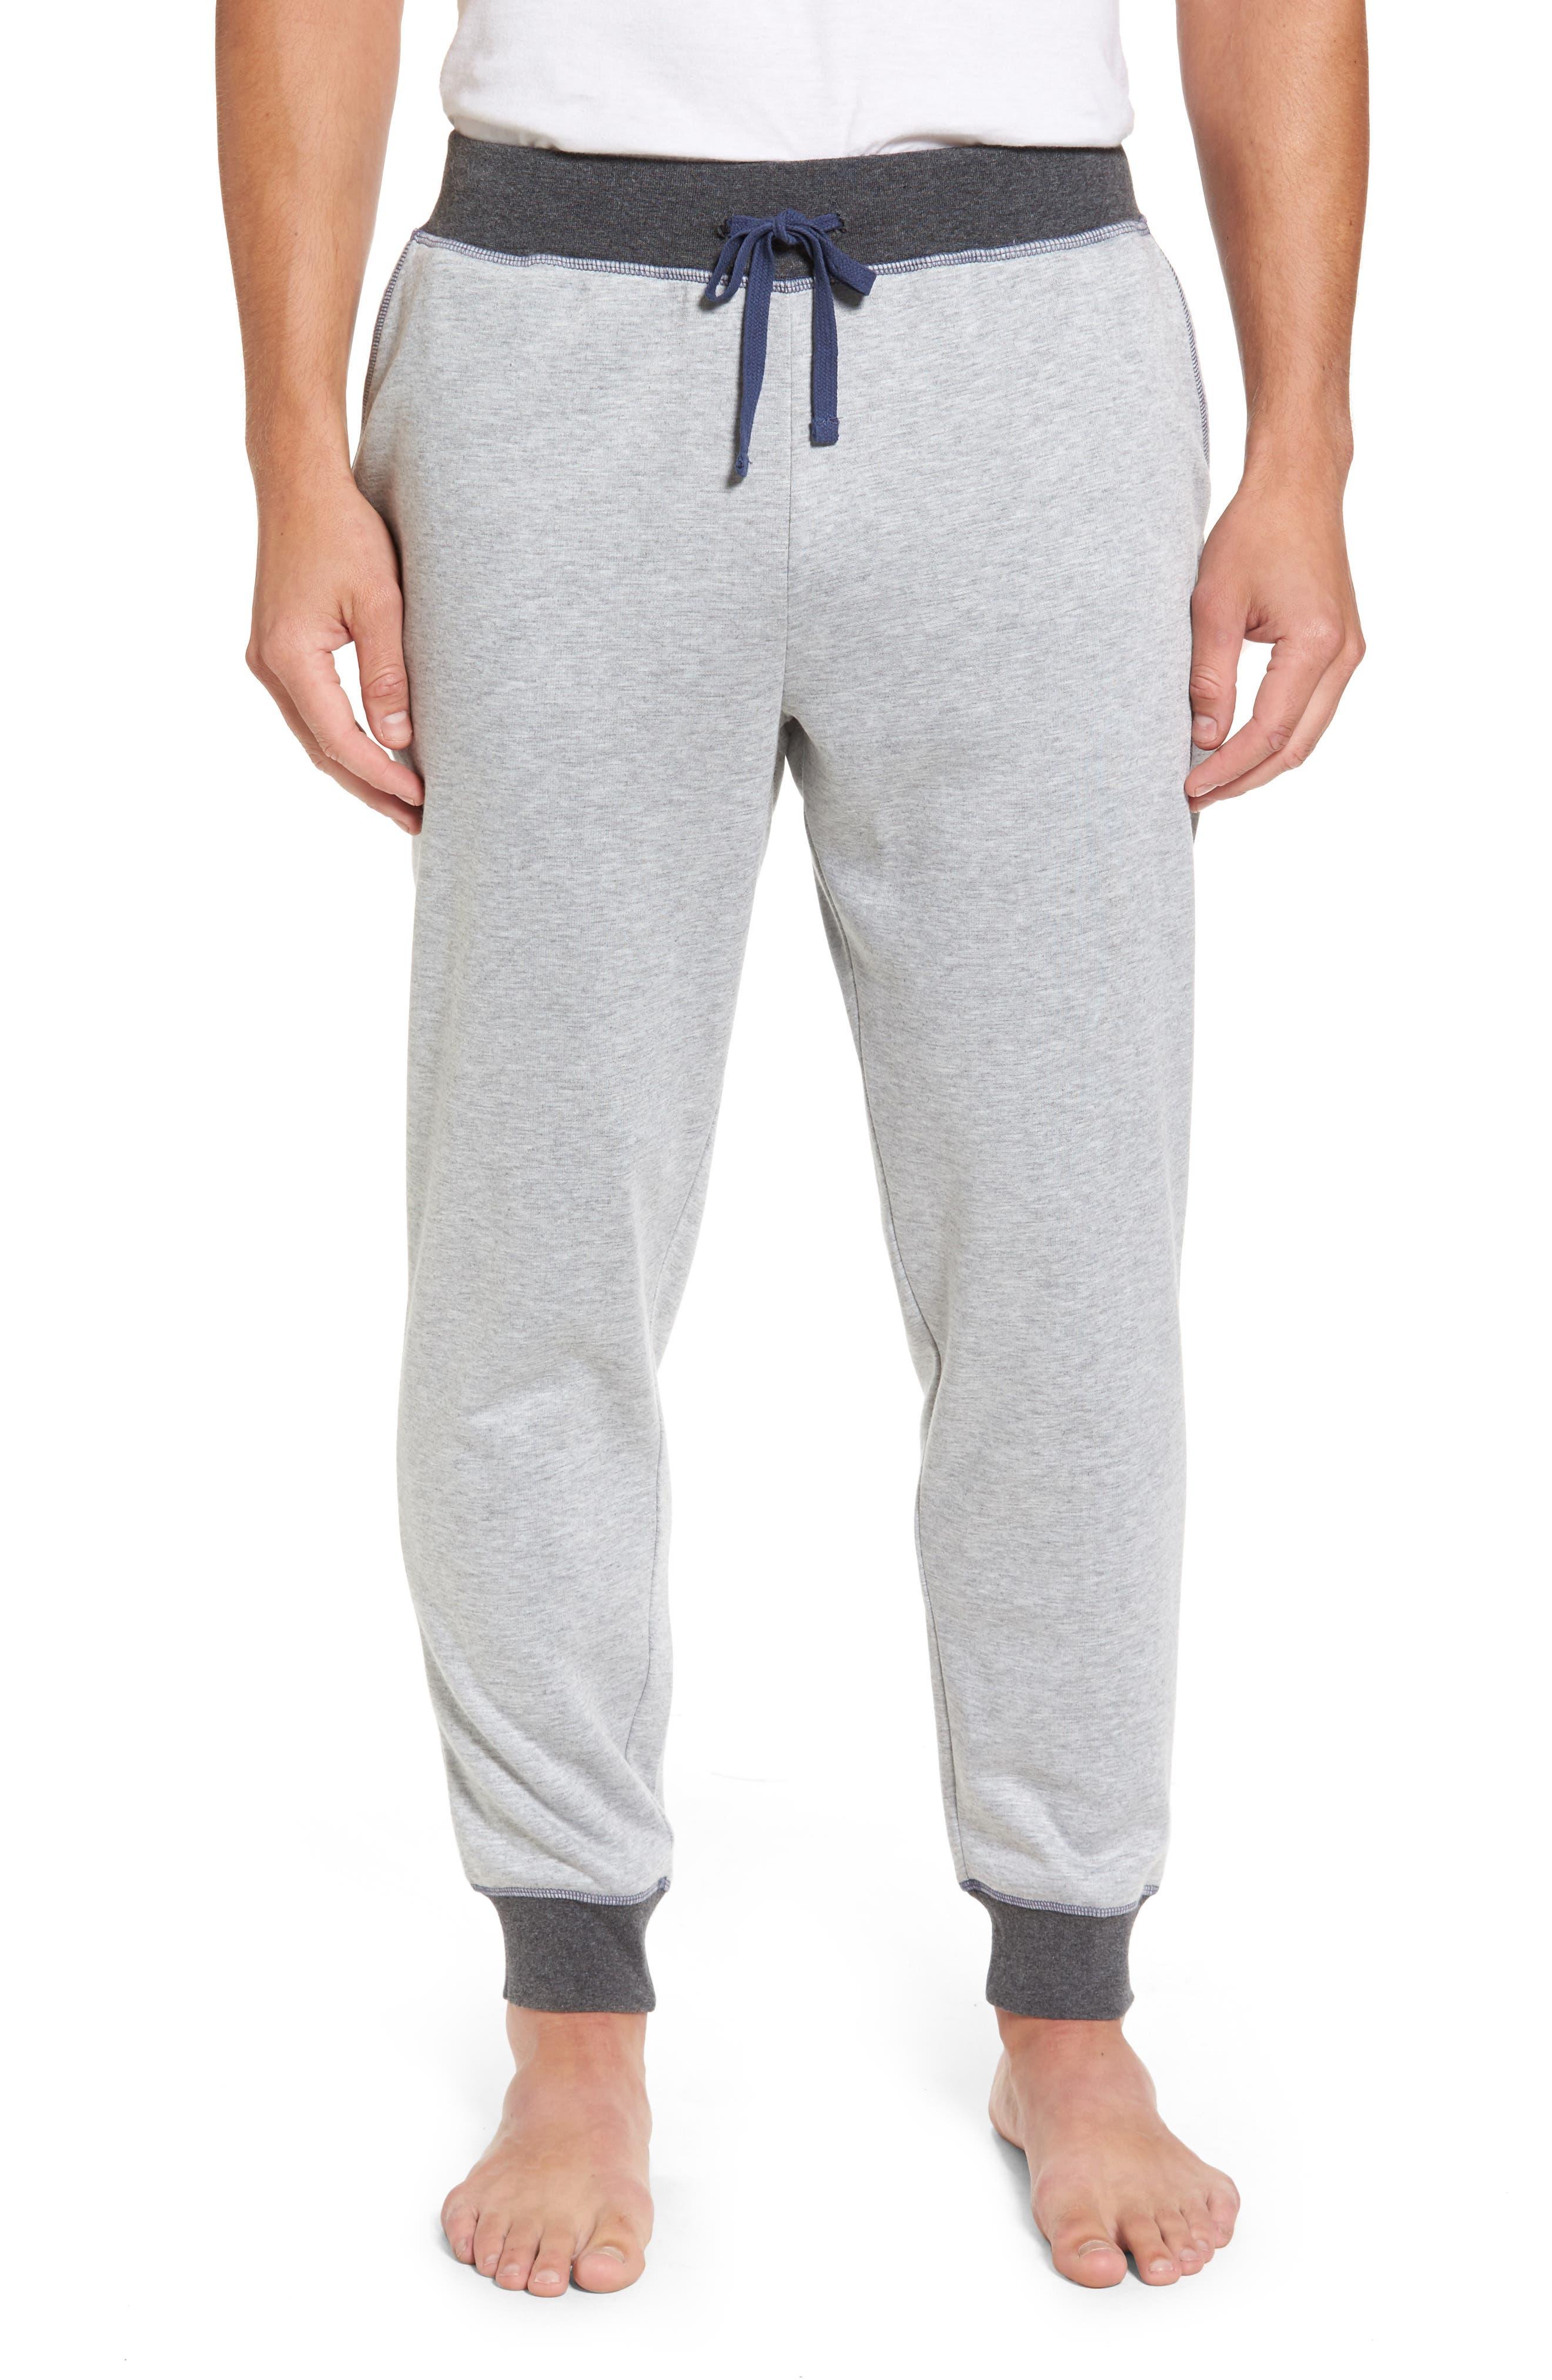 Alternate Image 1 Selected - Majestic International Double Take Knit Lounge Pants